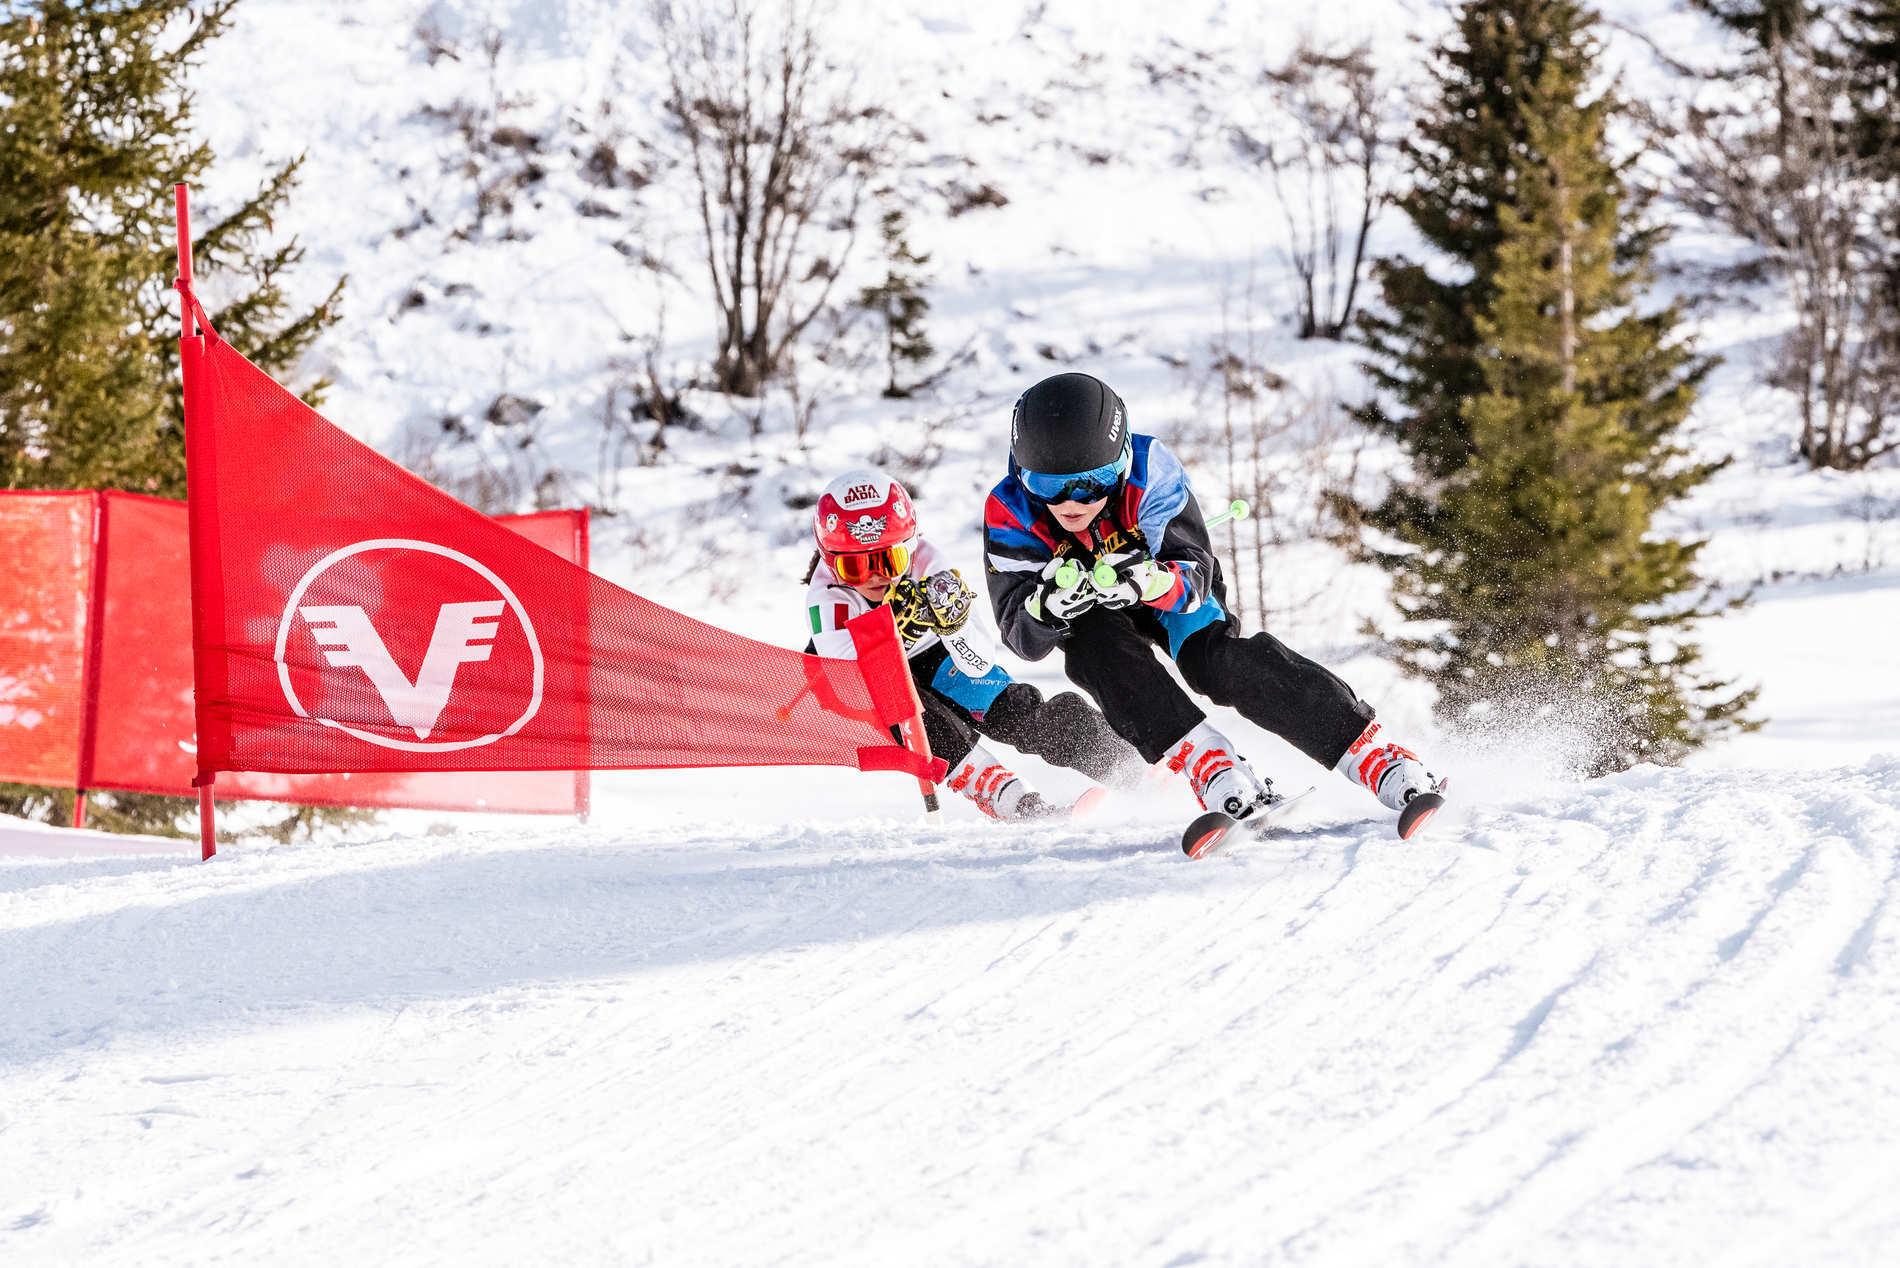 alta badia 02 03 2019 action fs christian riefenberg qparks 90